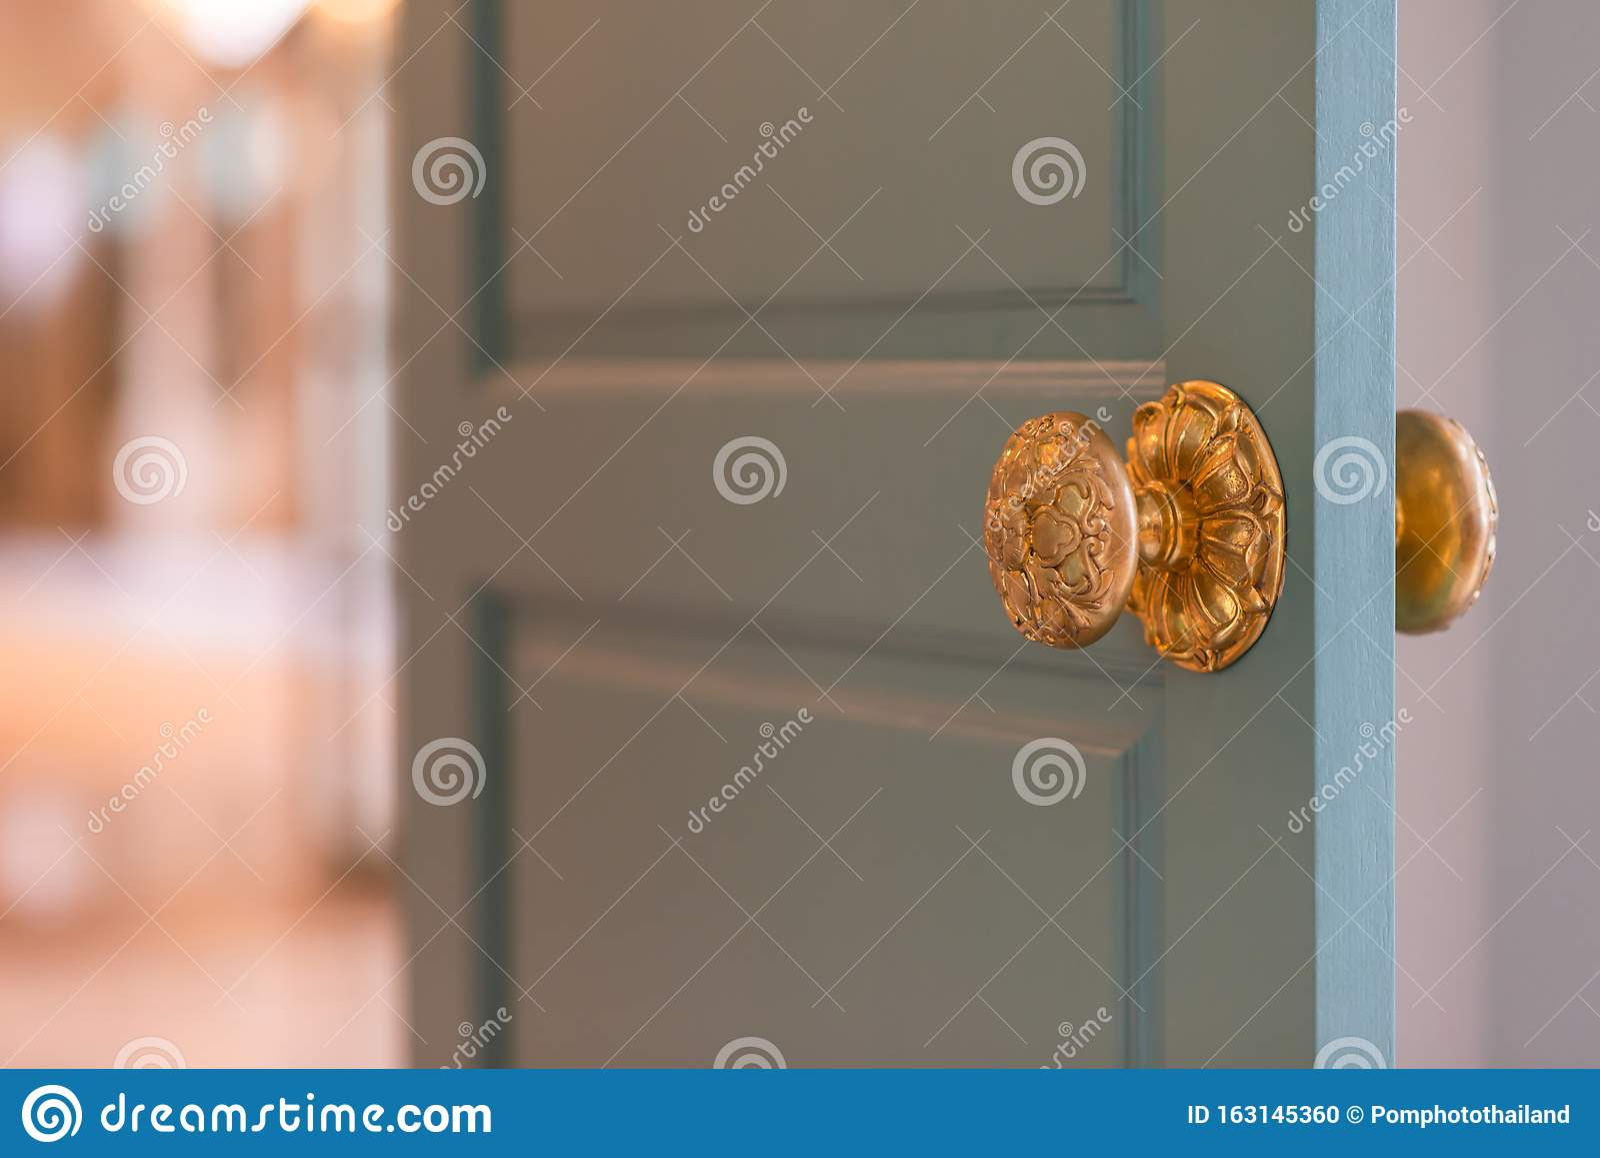 Classic Retro Brass Door Knob Vintage Decoration Retro Interior Stock Photo Image Of Handle House 163145360